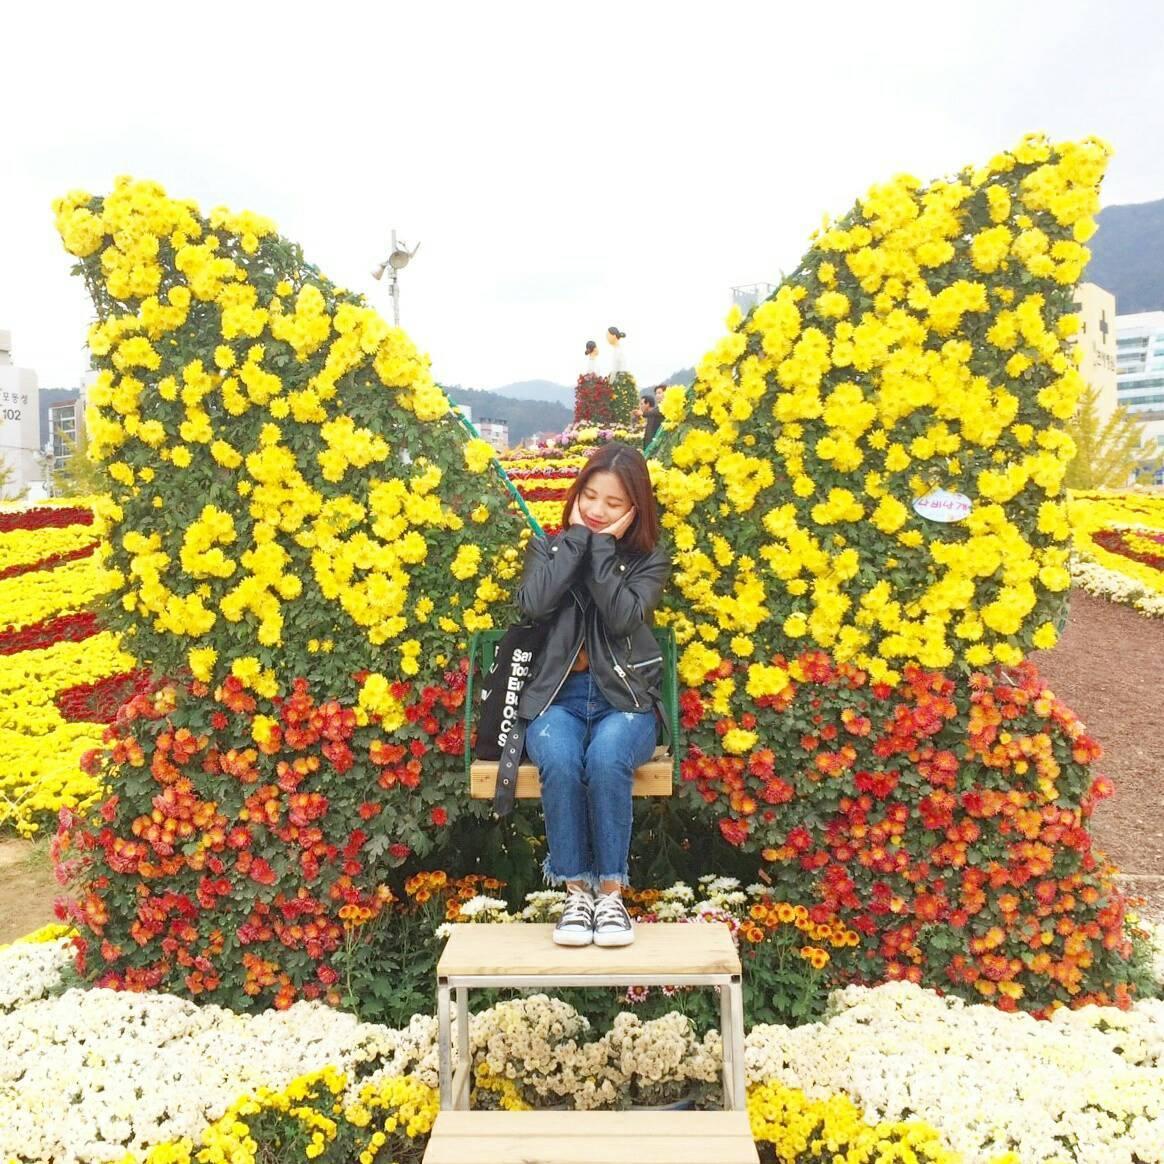 馬山菊祭り_d0160145_15273246.jpg